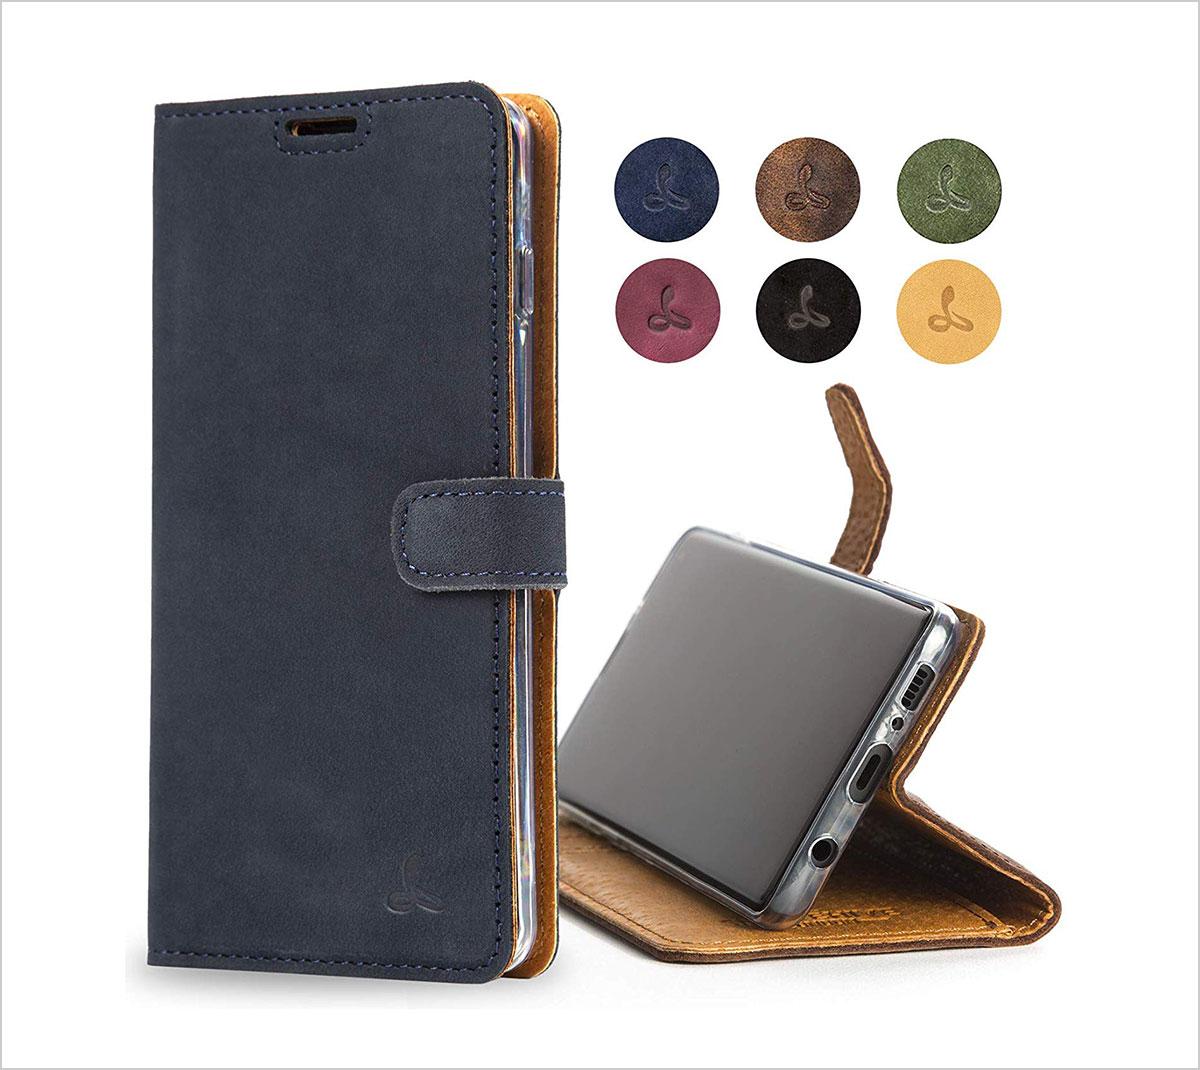 Luxury-Genuine-Leather-Samsung-Galaxy-S10-Case